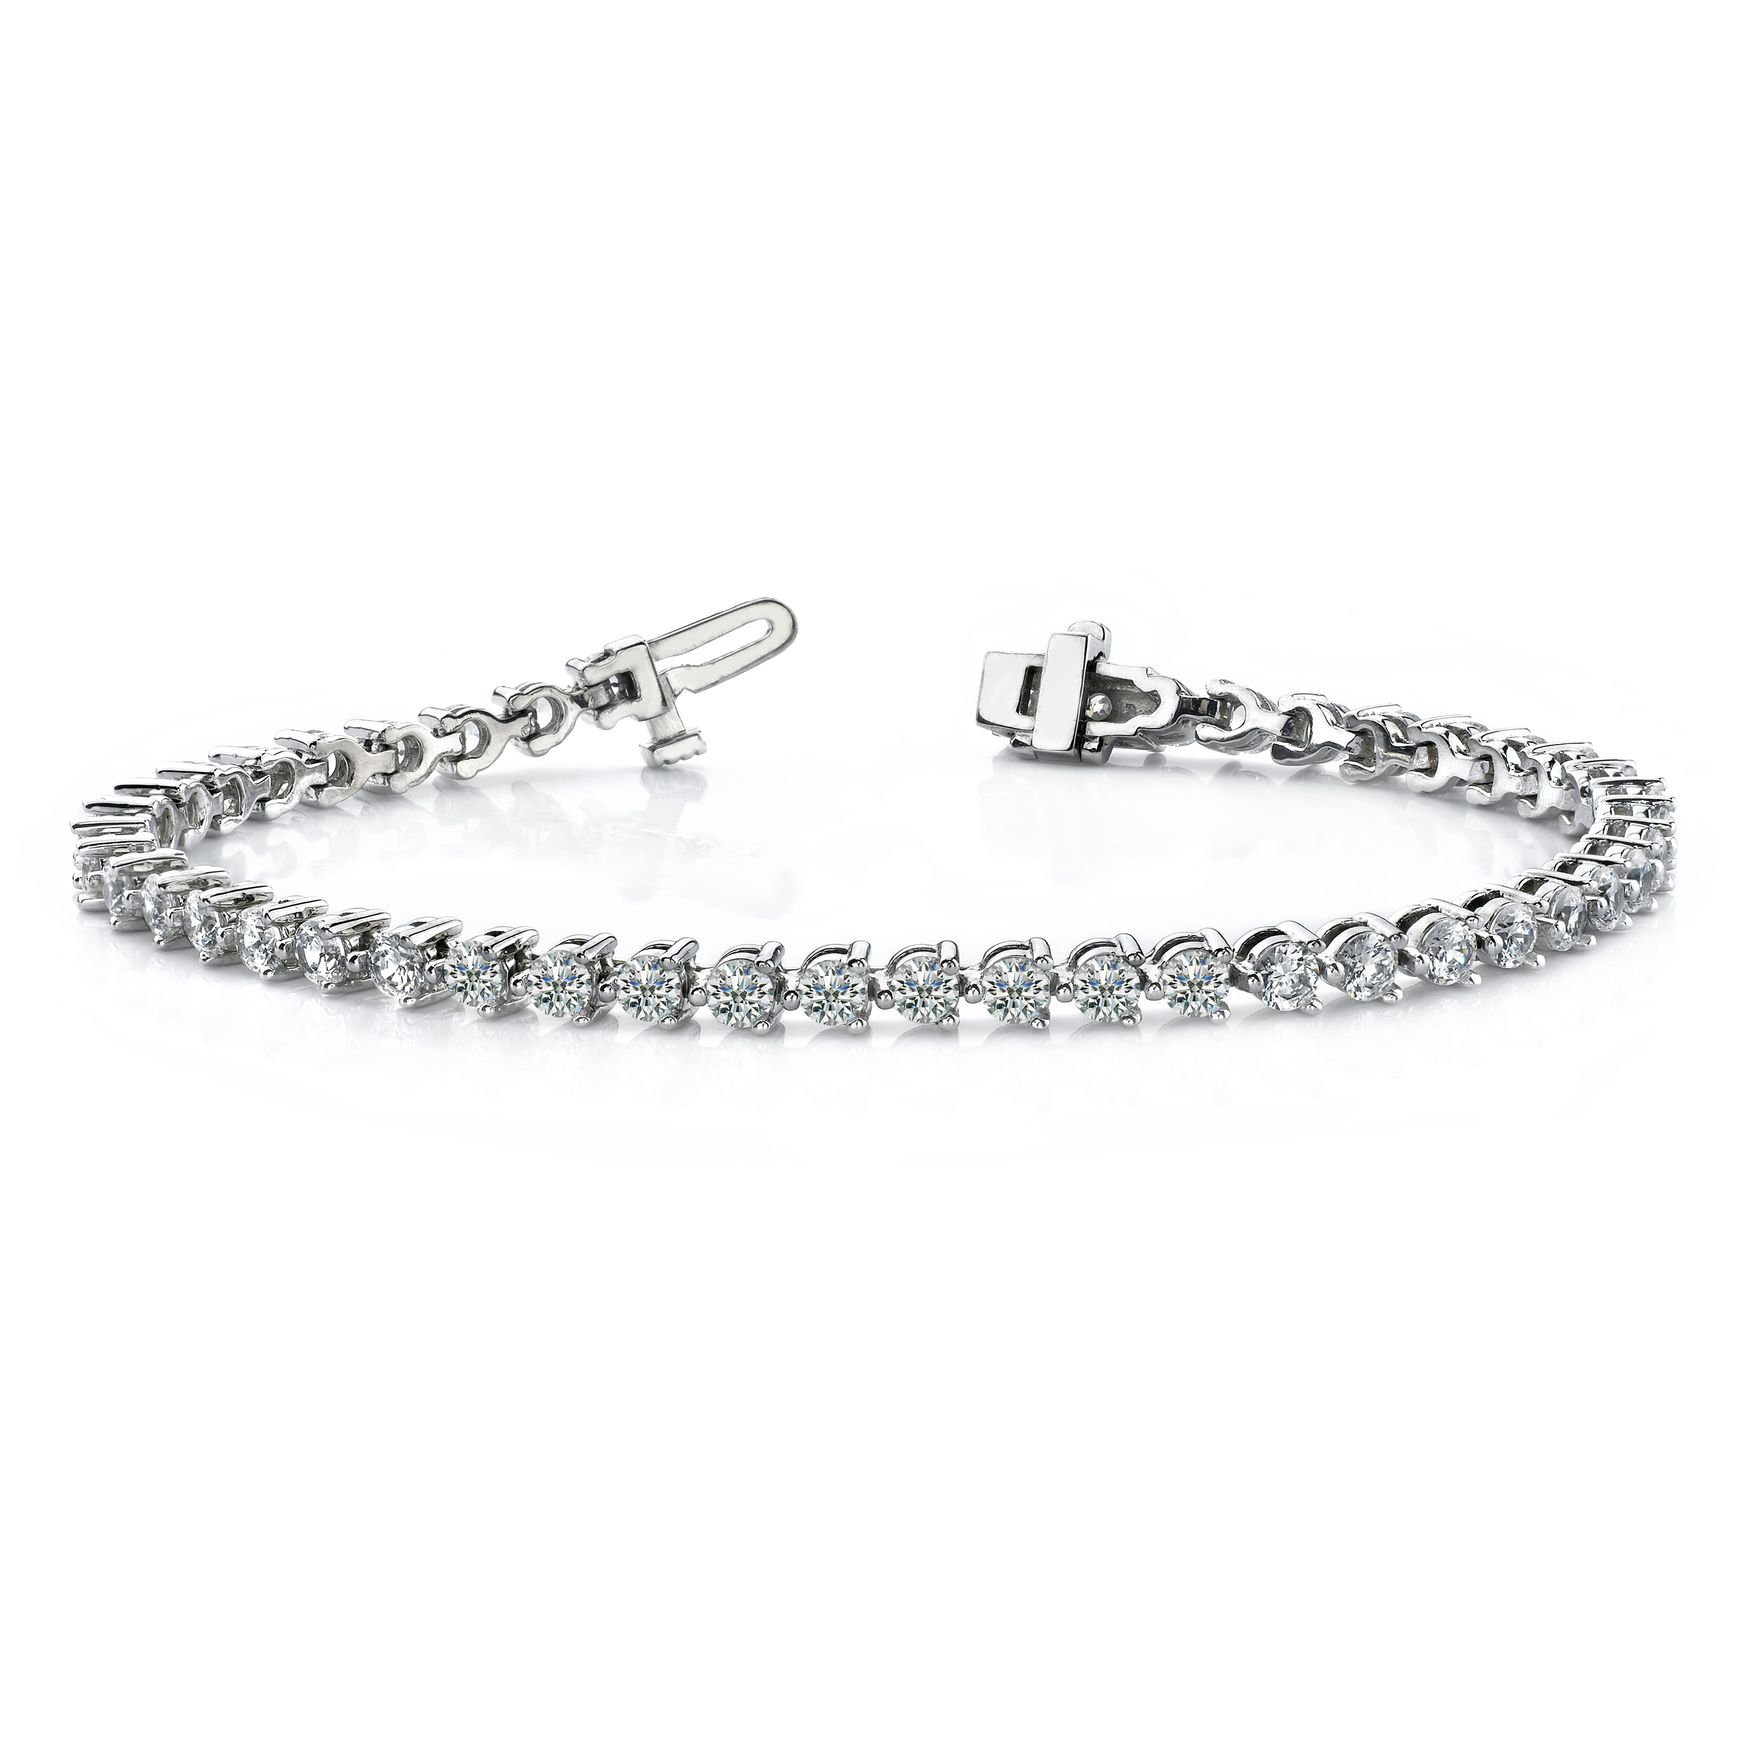 White Gold Tennis Bracelet Round Line Tennis Diamond Bracelet